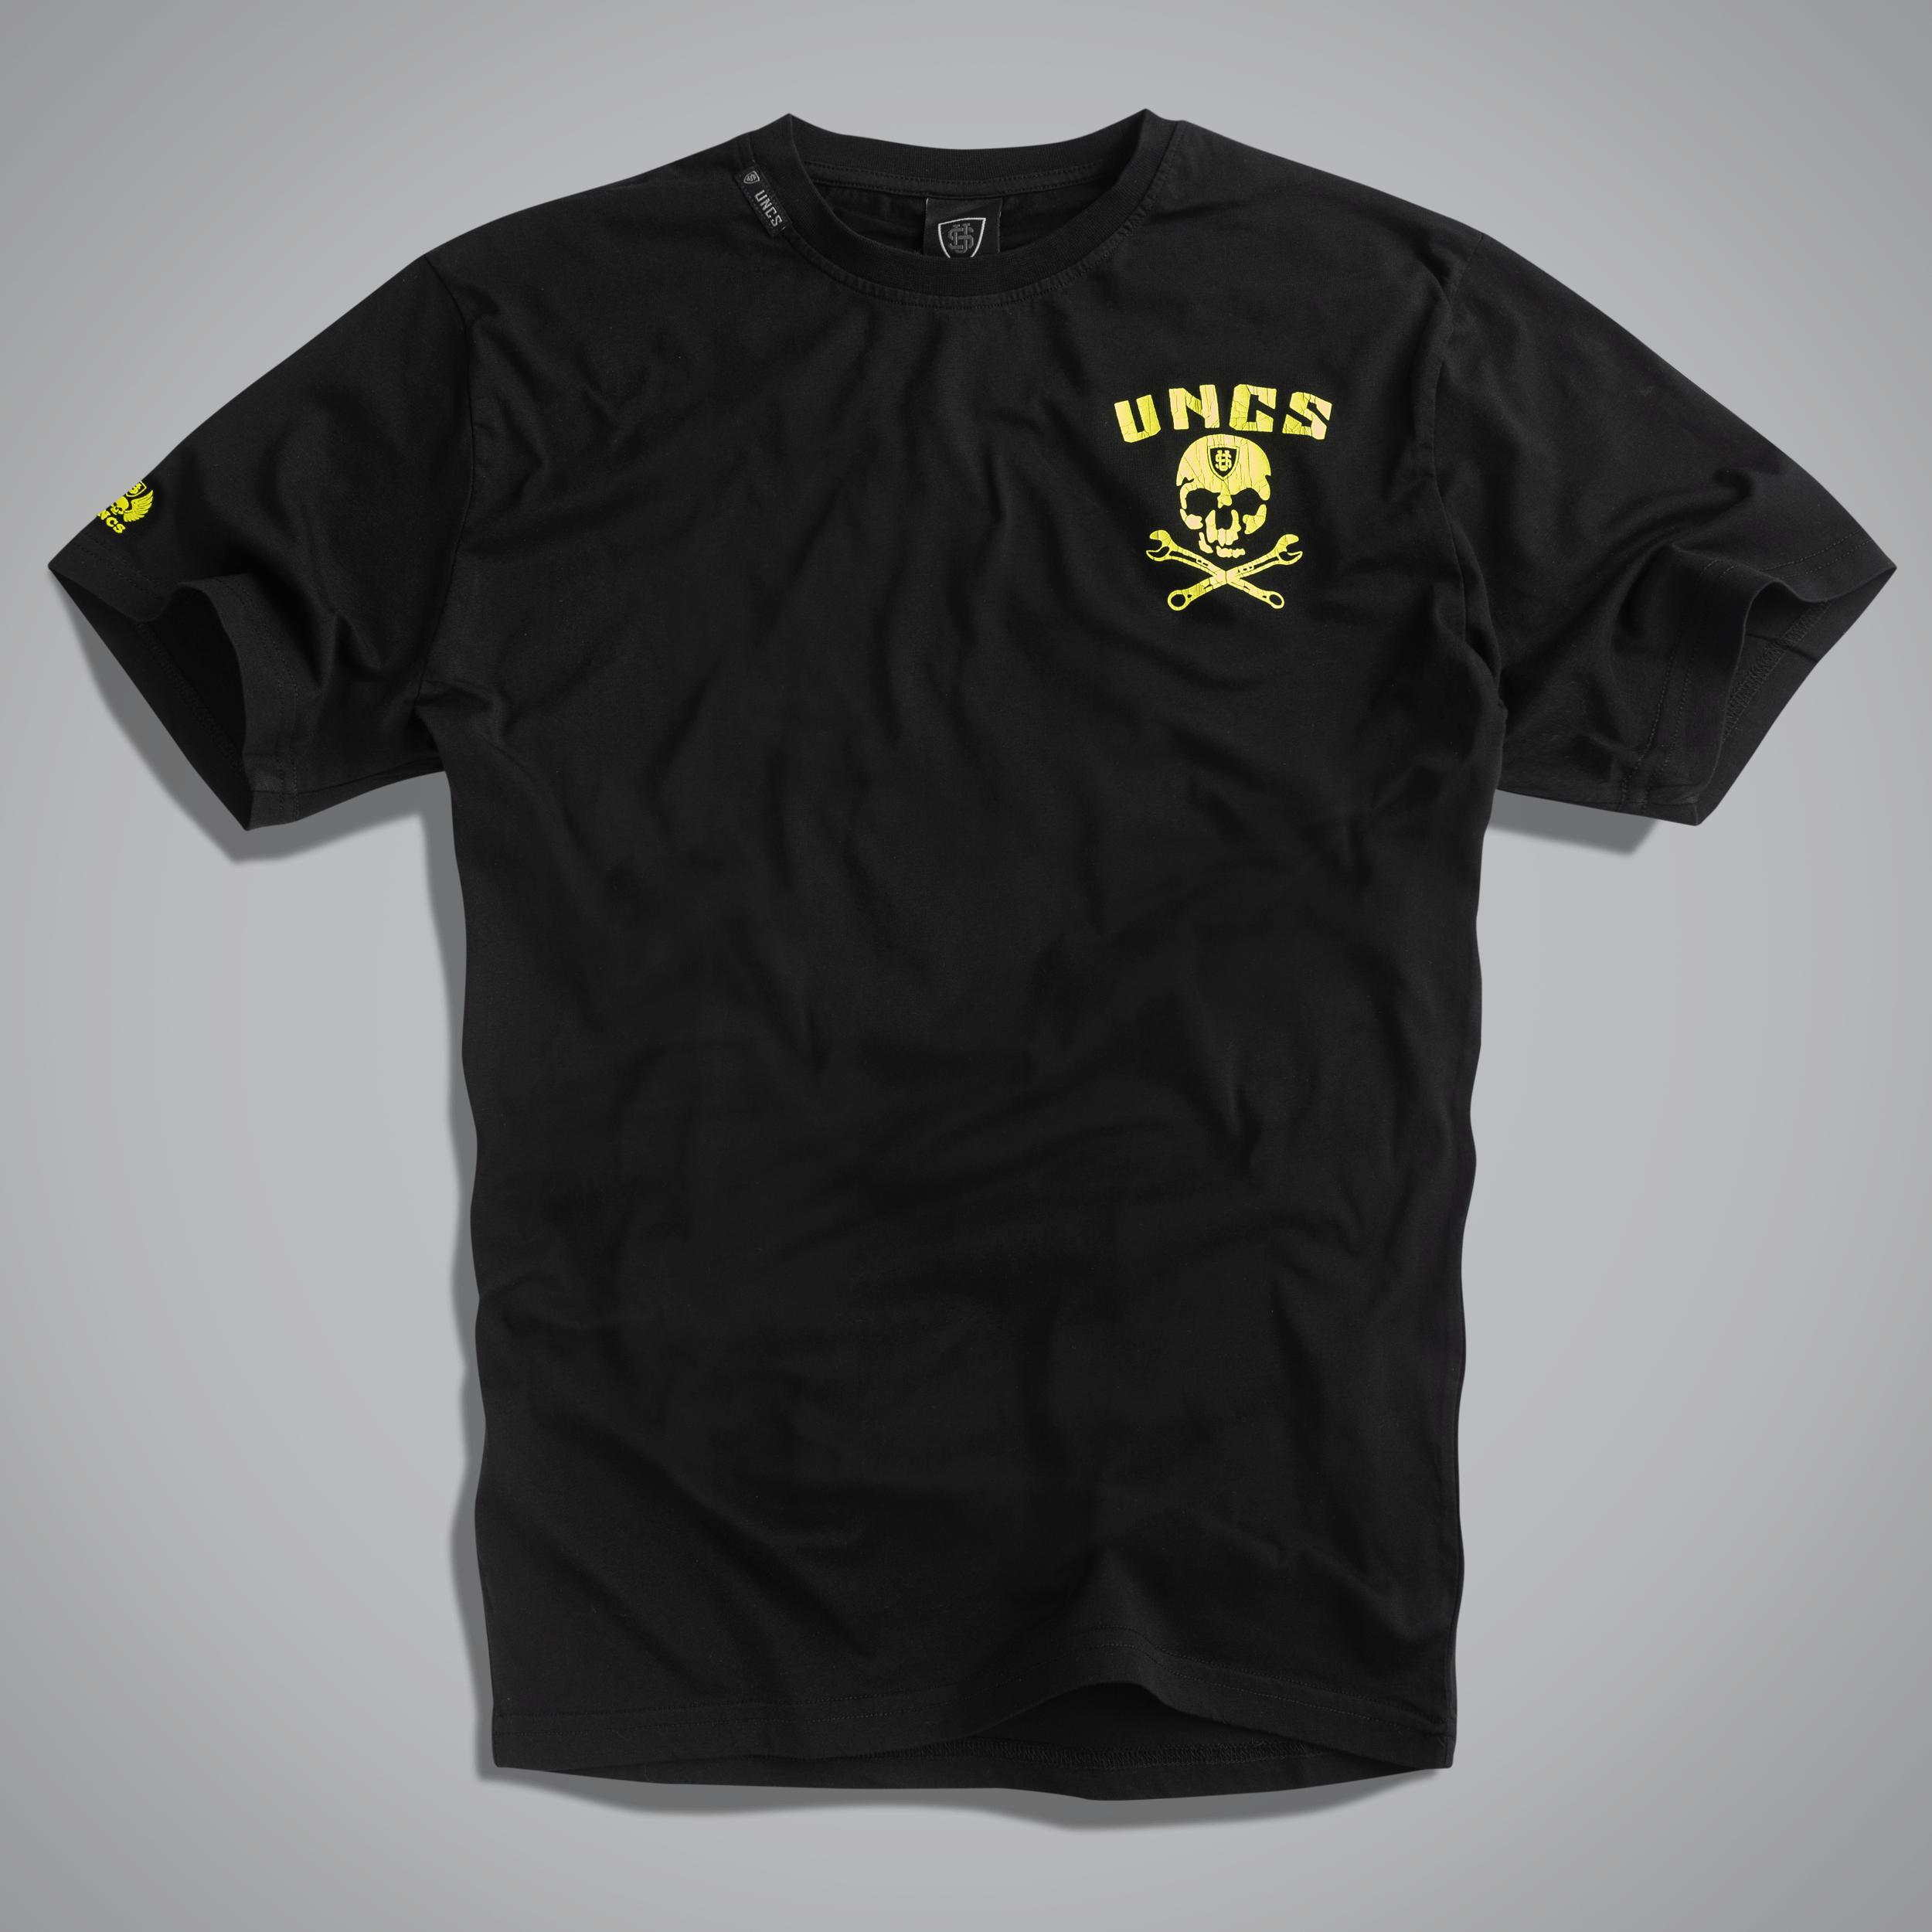 Rumble T-Shirt - Ausverkauf eb4bdc2657